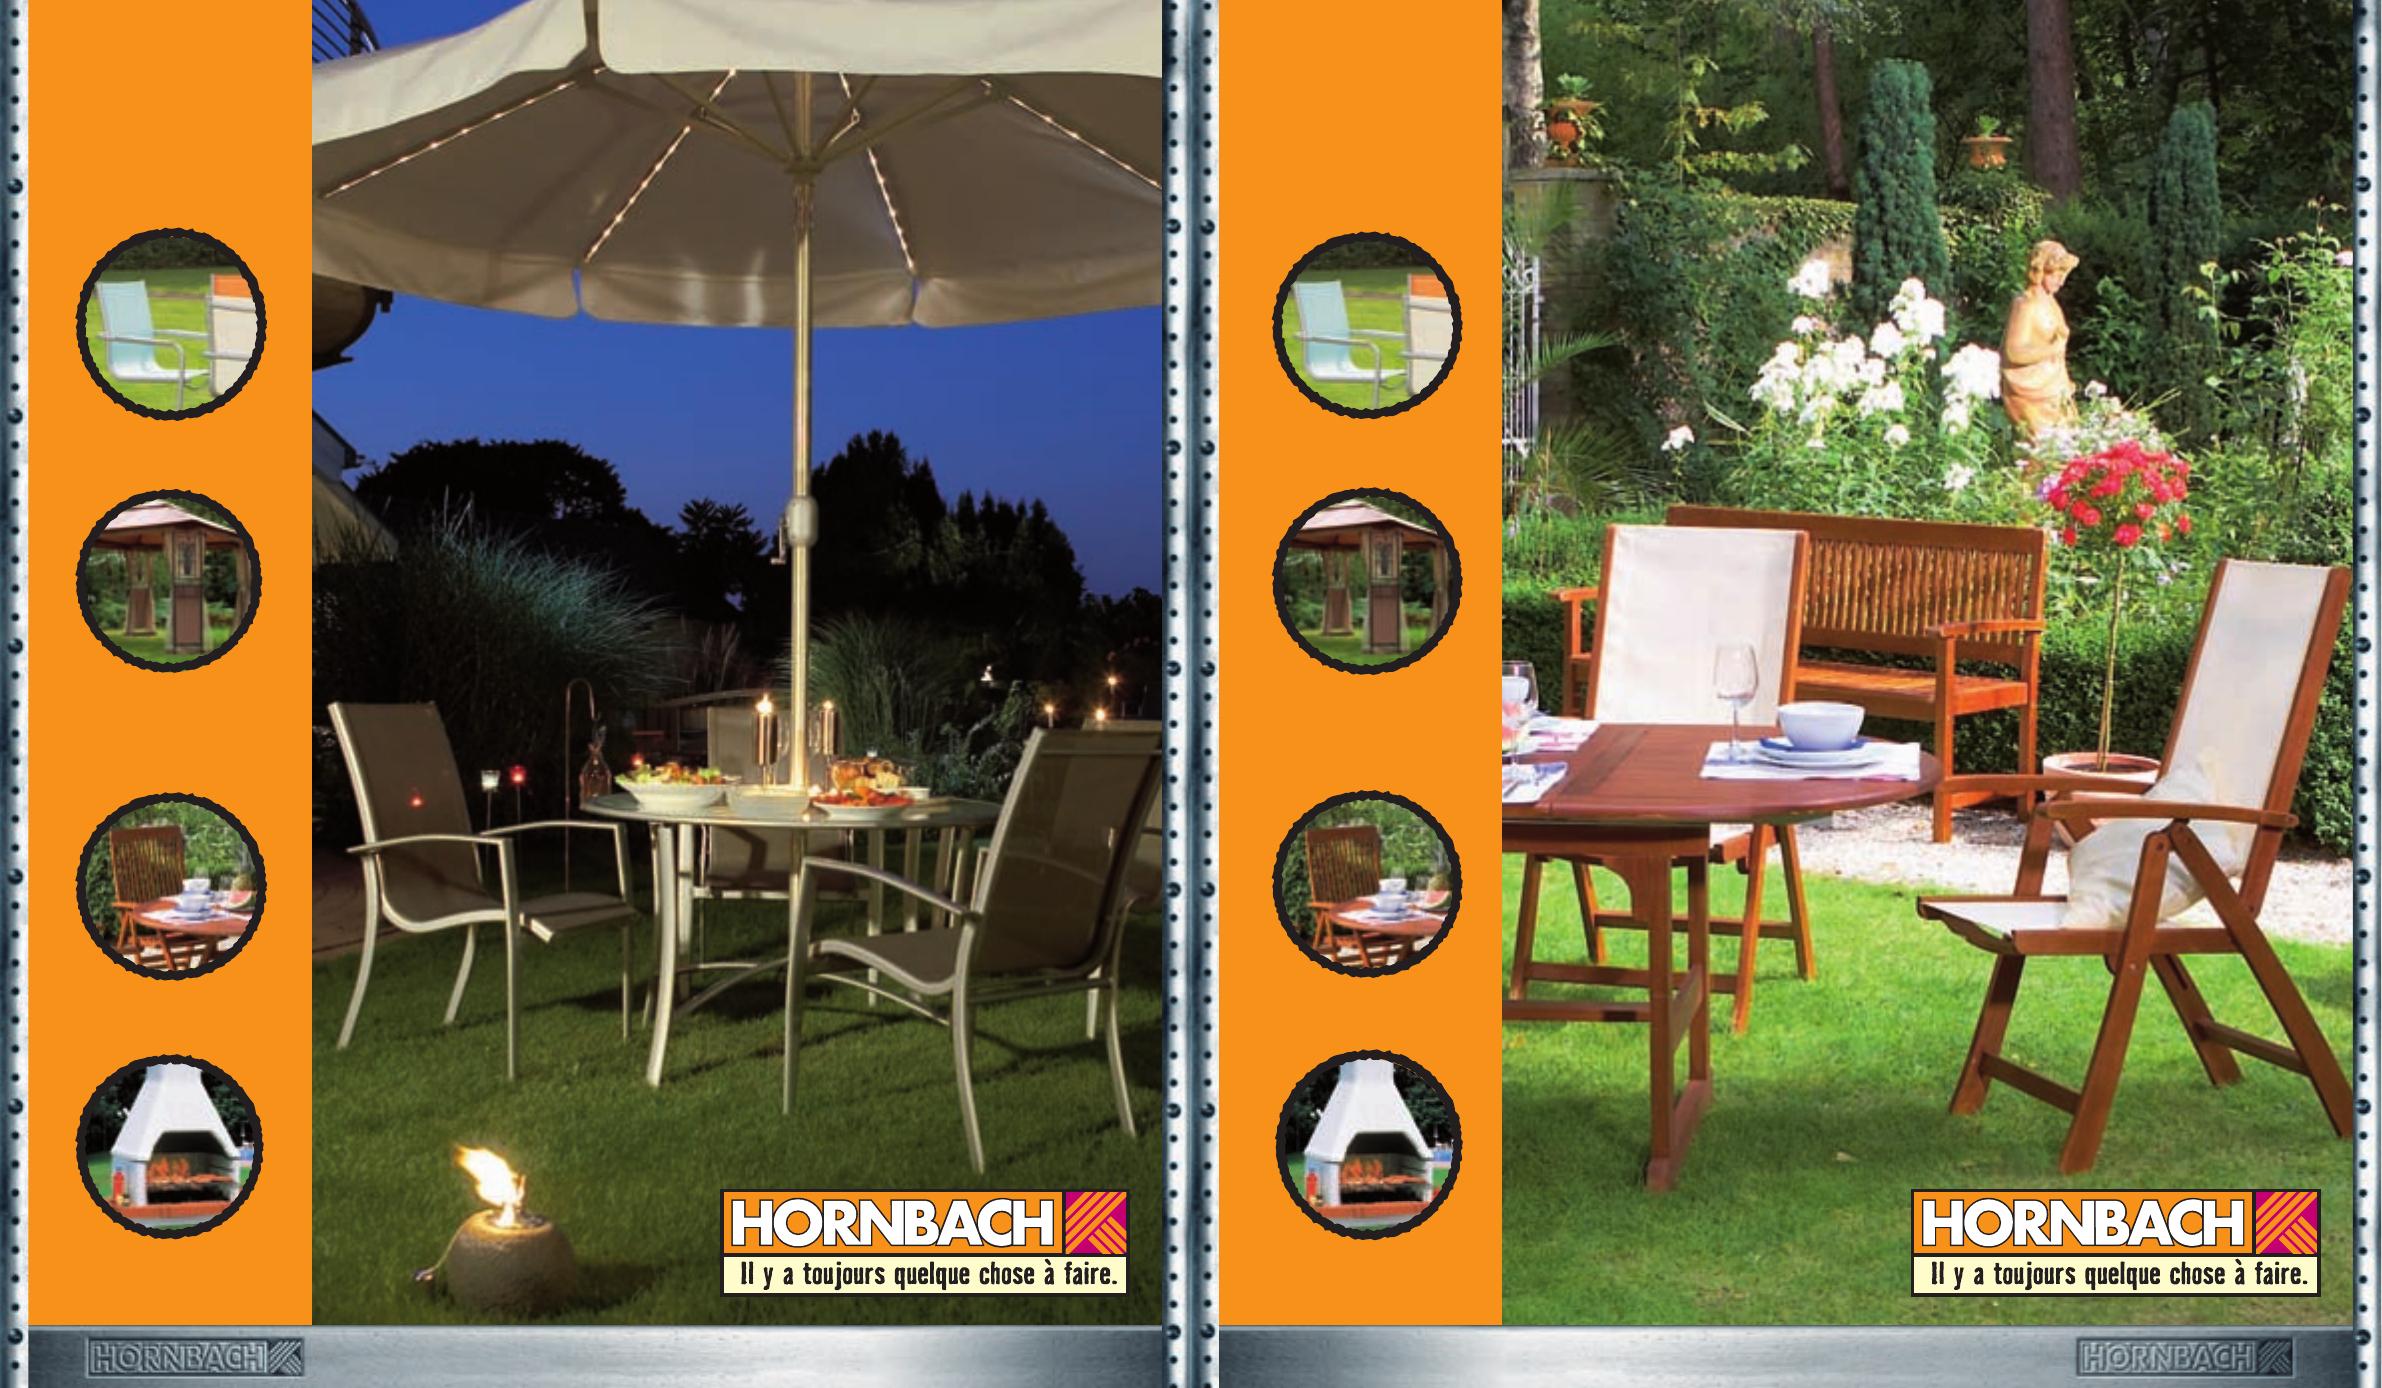 Hornbach Fr Sh2006 Meubles De Jardin - [Pdf Document] tout Hornbach Jardin